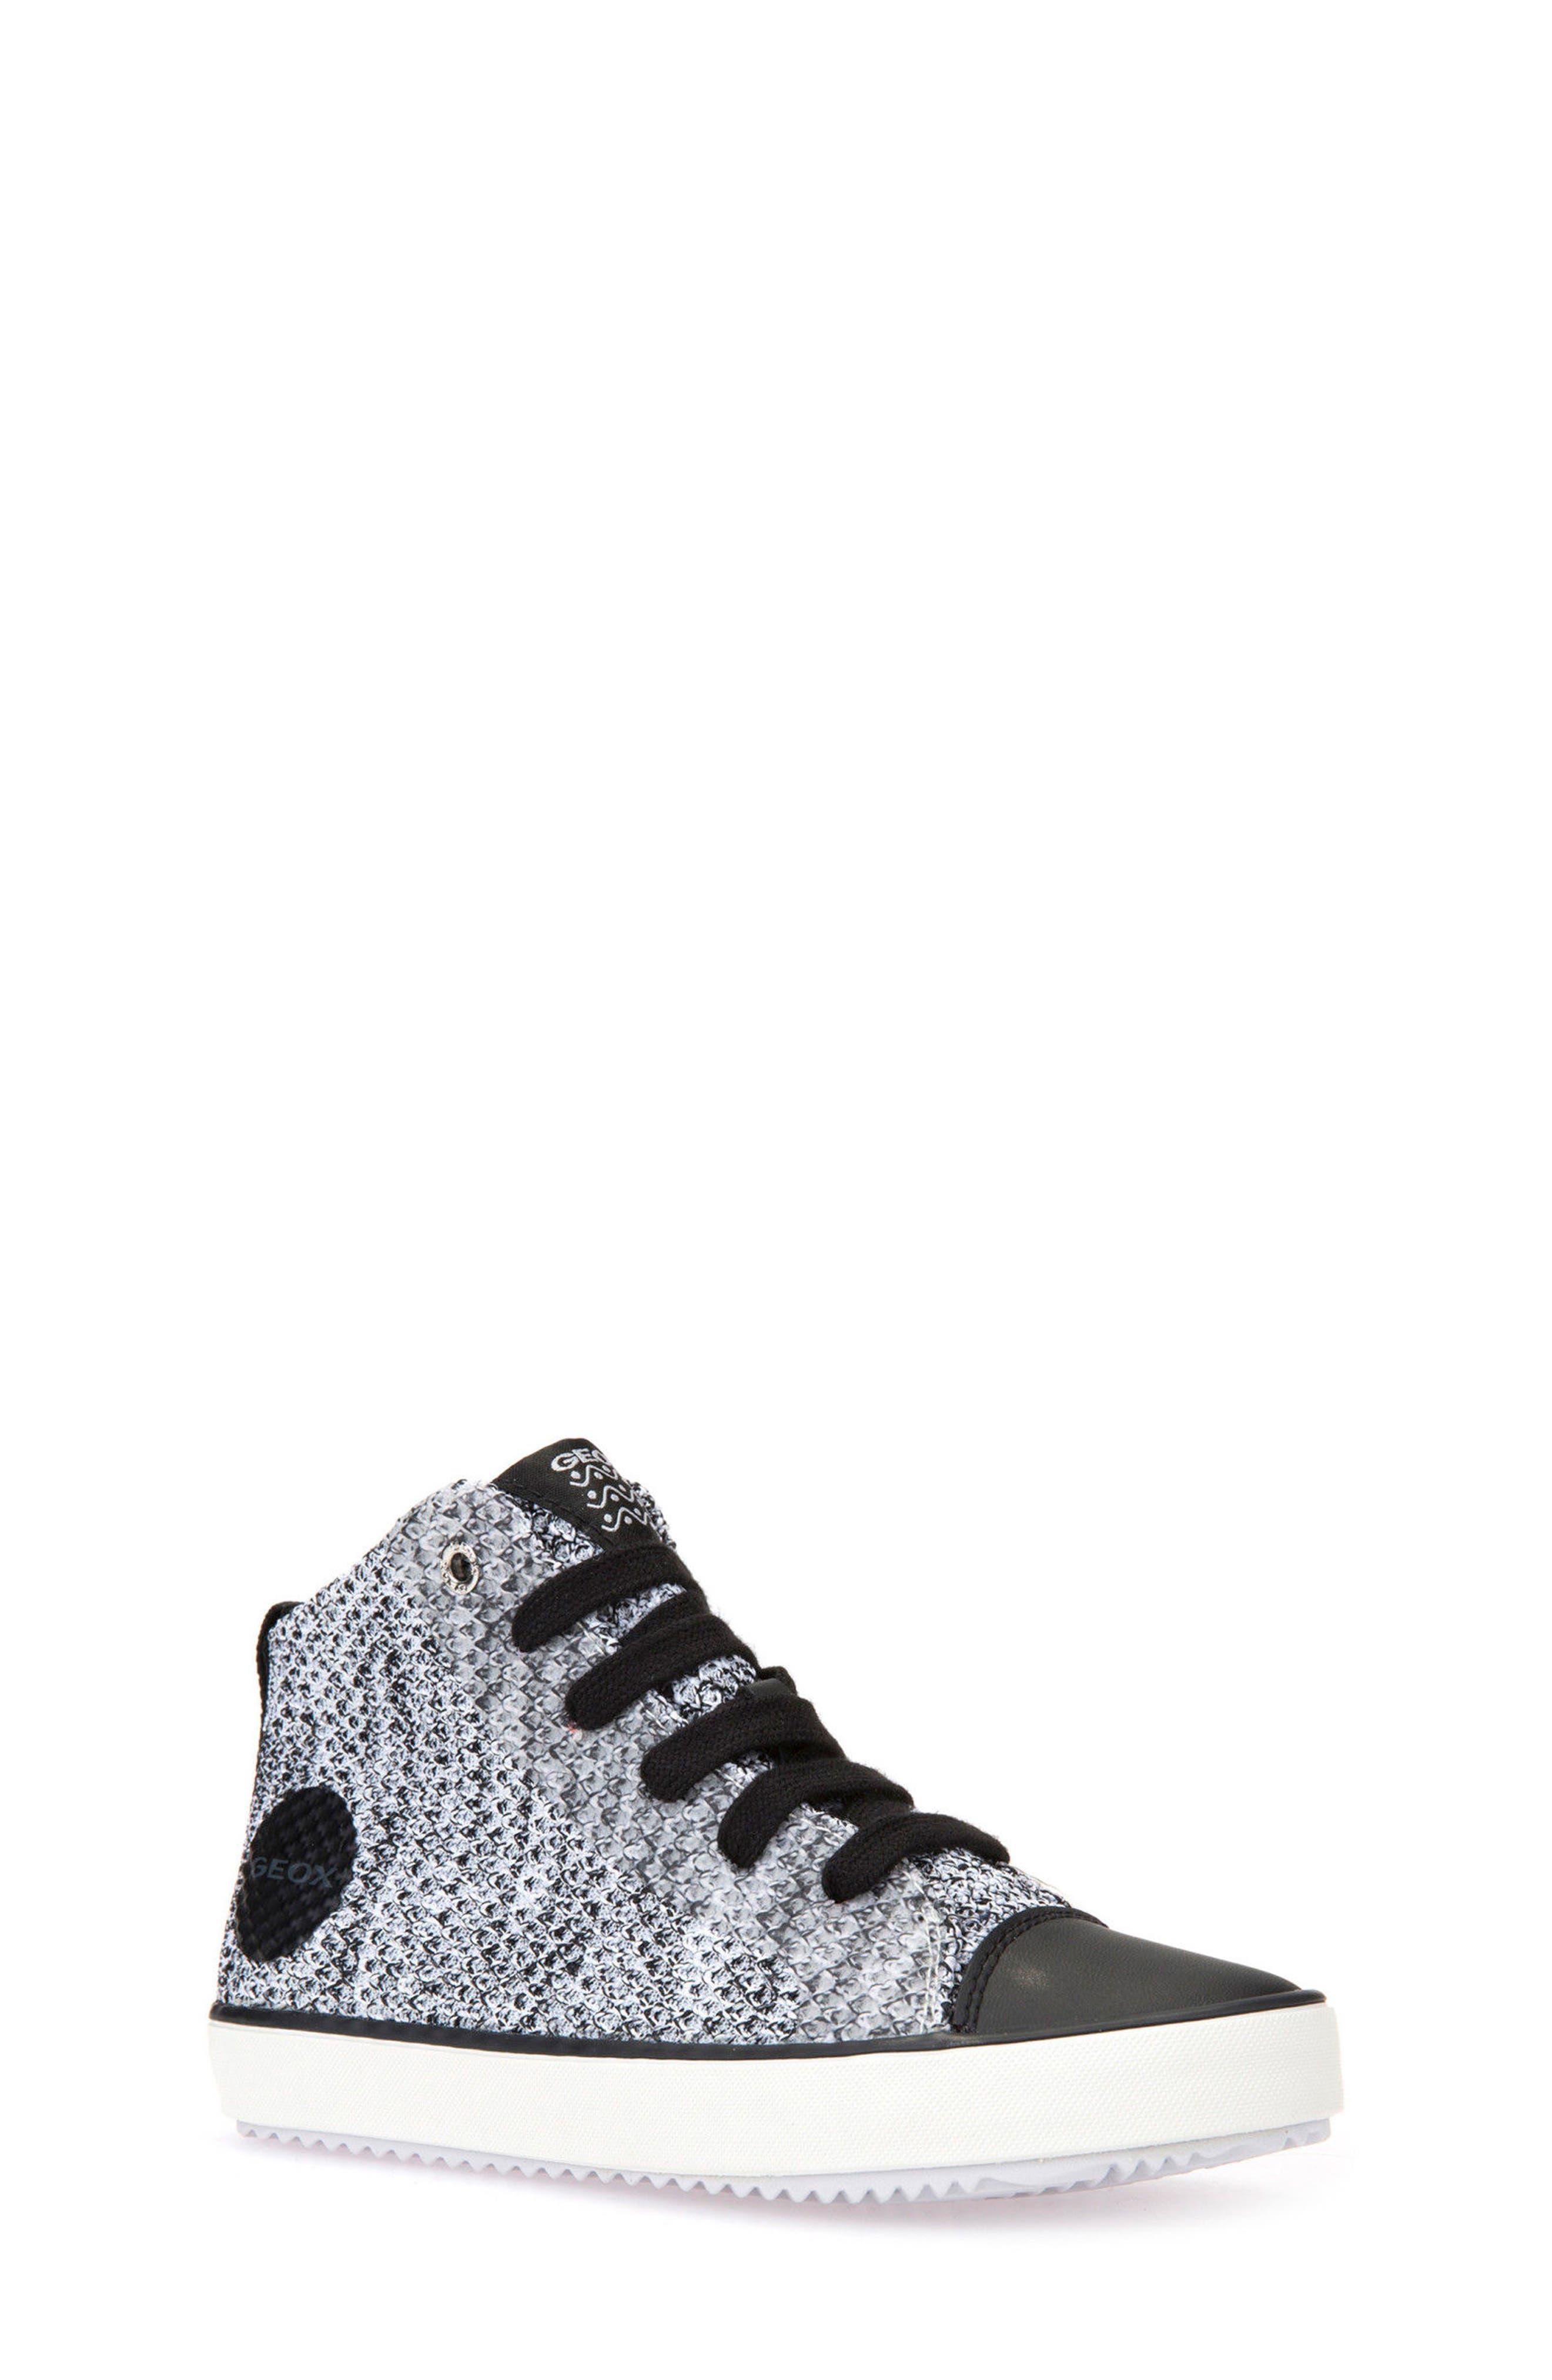 Alonisso Knit Mid Top Sneaker,                         Main,                         color, WHITE/ BLACK